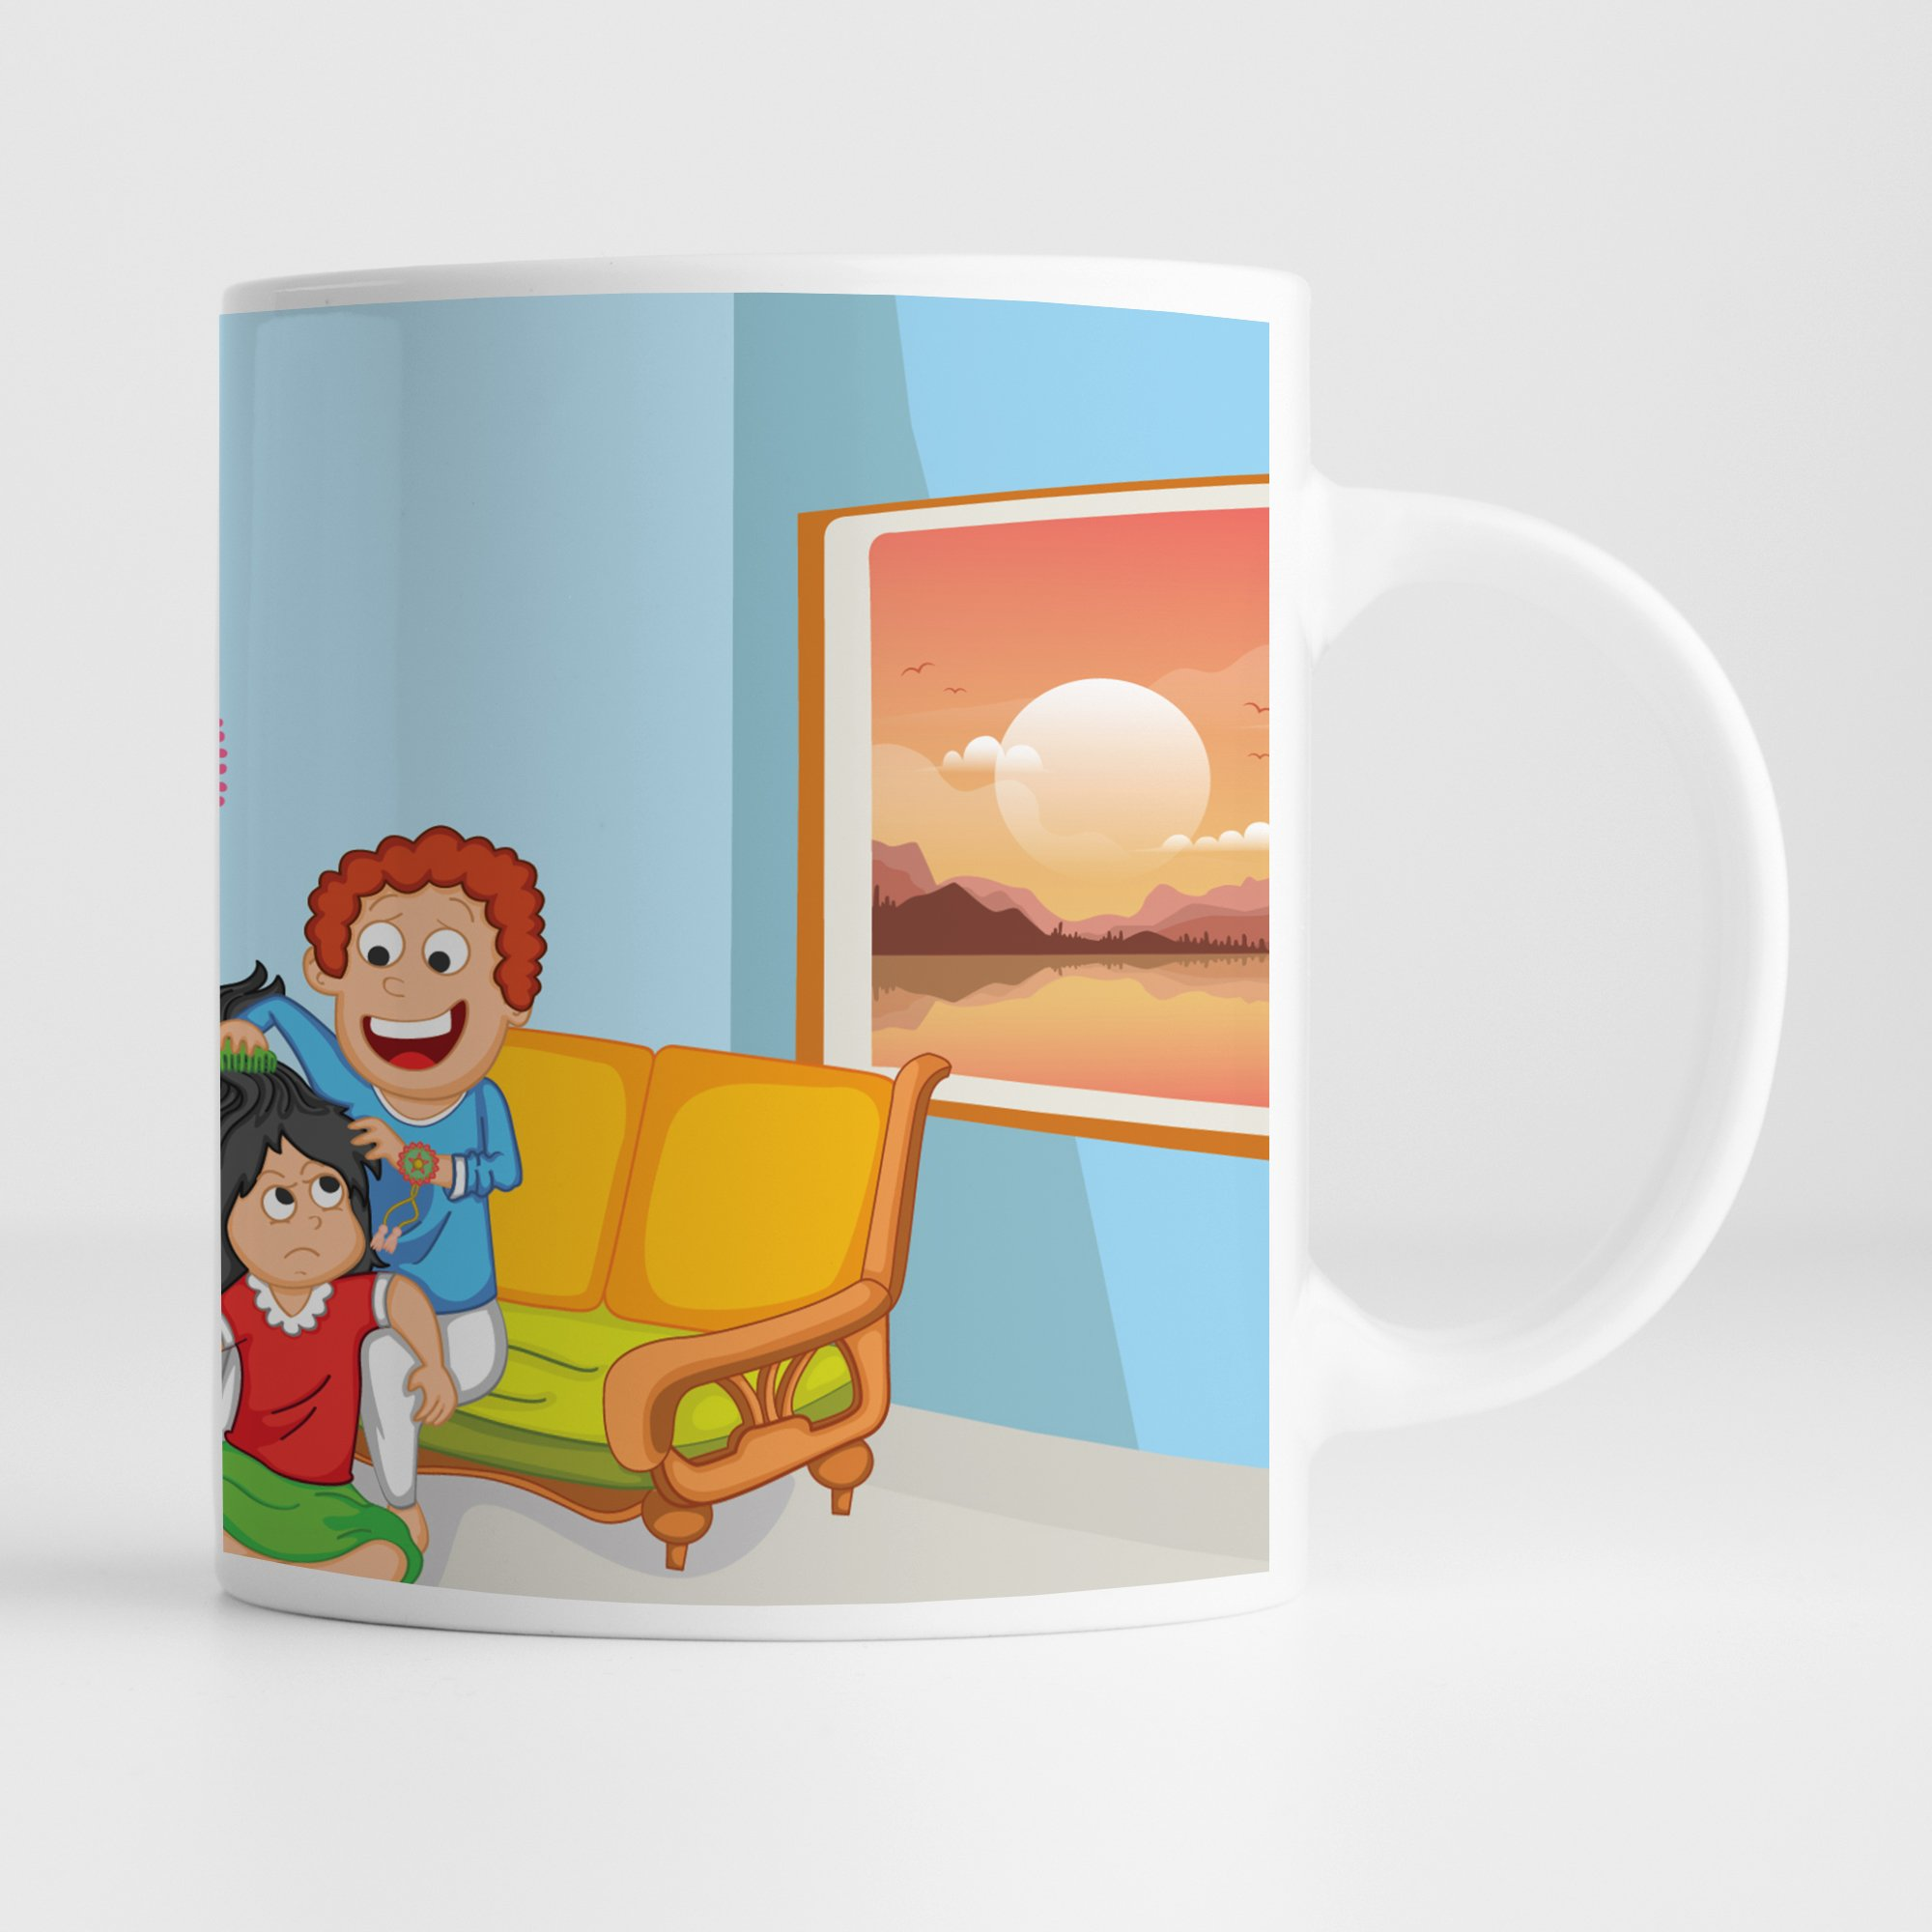 Ceramic Mug  Happy Raksha Bandhan   Rakshabandhan Gift For Brother  Rakhi Gift For Sister  Gift For Rakhi Superior Quality Ceramic Mug